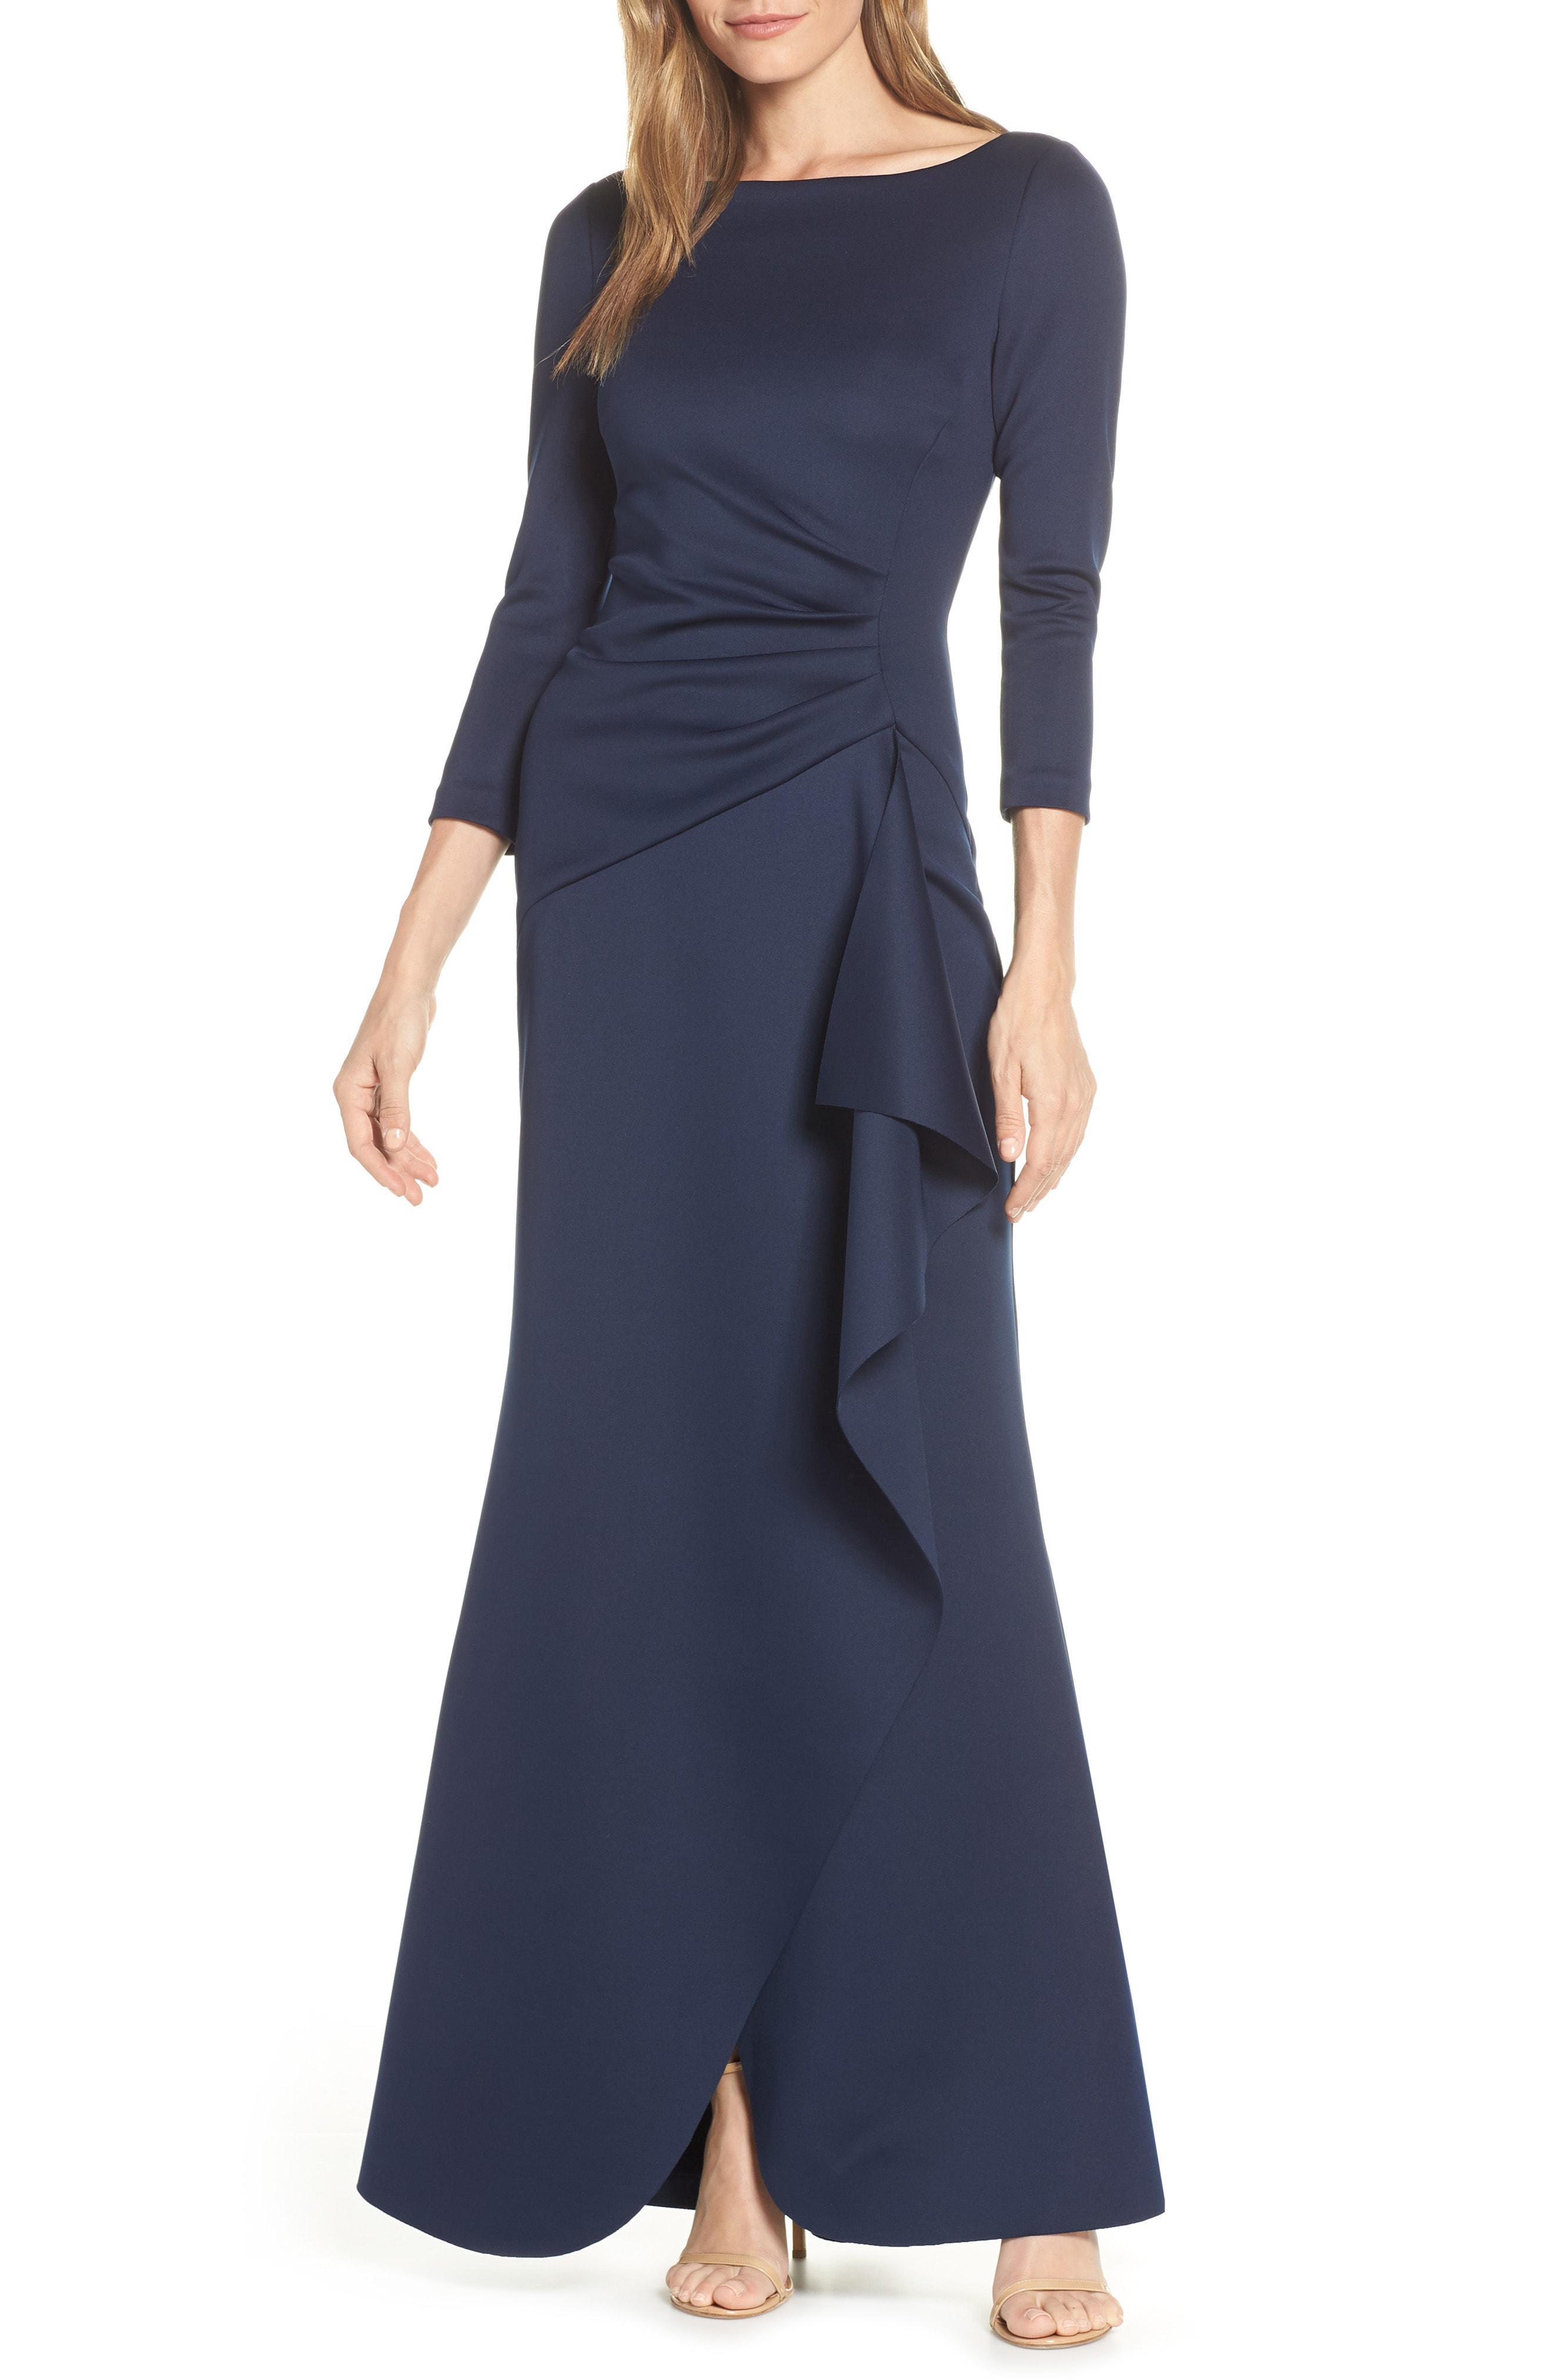 1e9df9e0a33c Eliza J Techno Scuba Pleat Evening Dress in Blue - Lyst